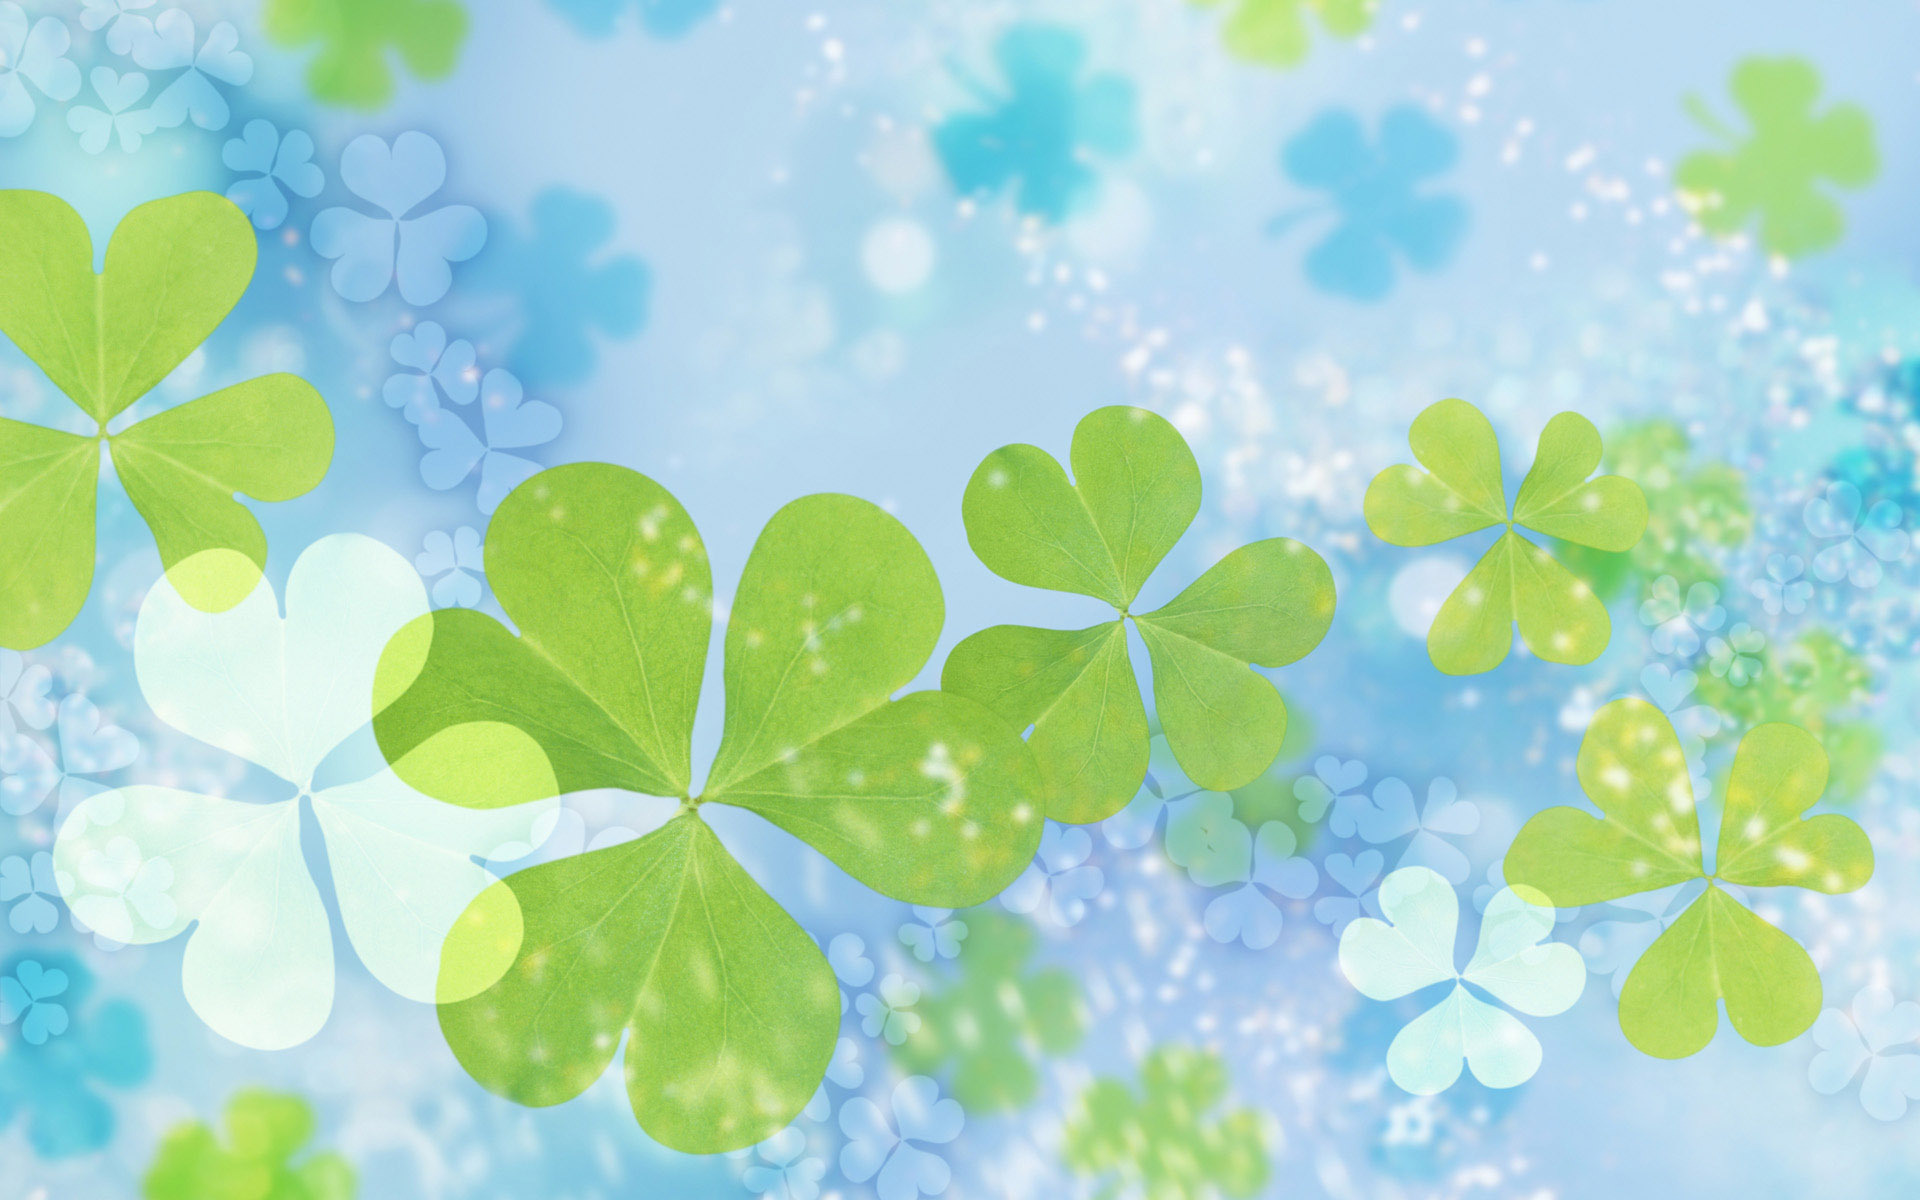 Saint Patricks Day Wallpapers   Wallpaper High Definition High 1920x1200